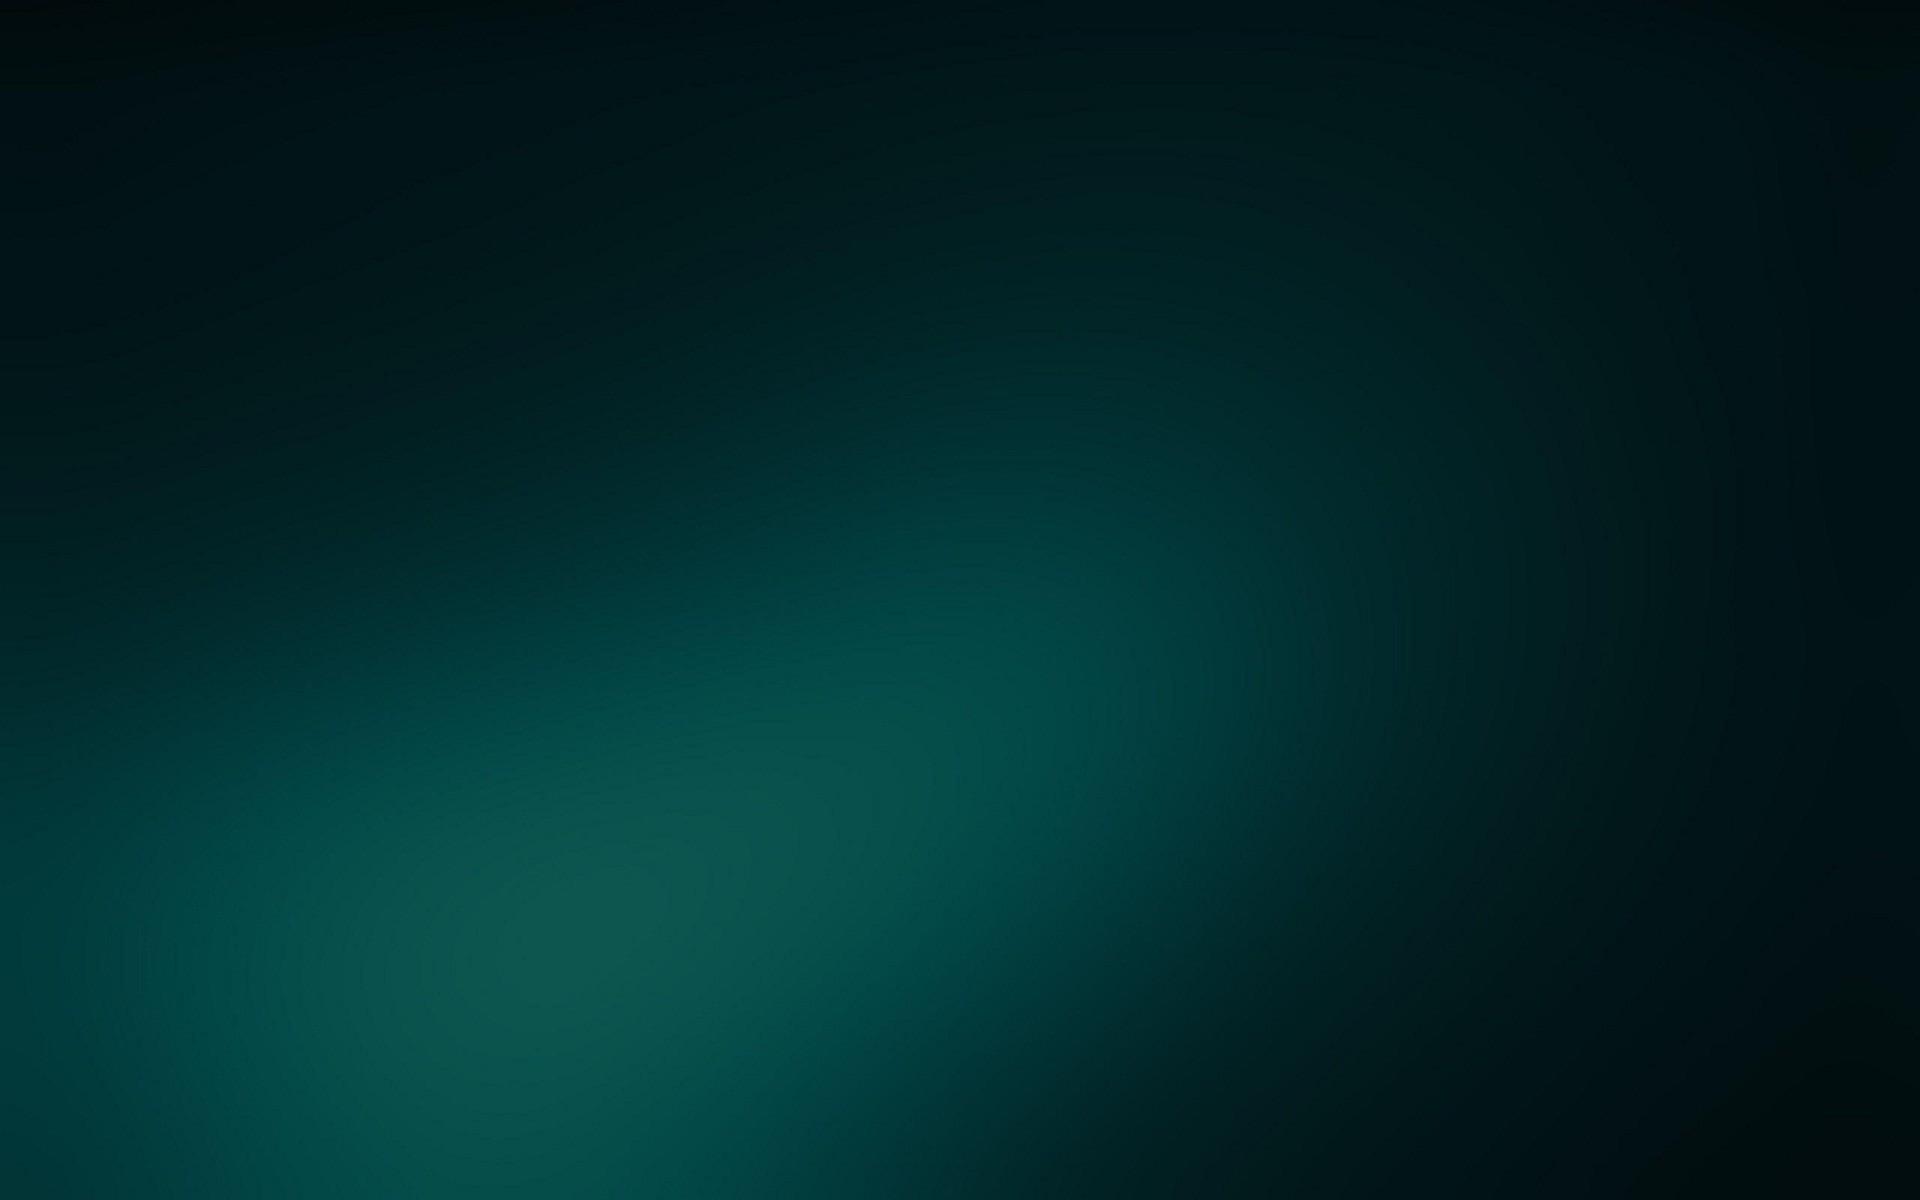 dark-green-shine-plain-full-hd-wide-wallpapers